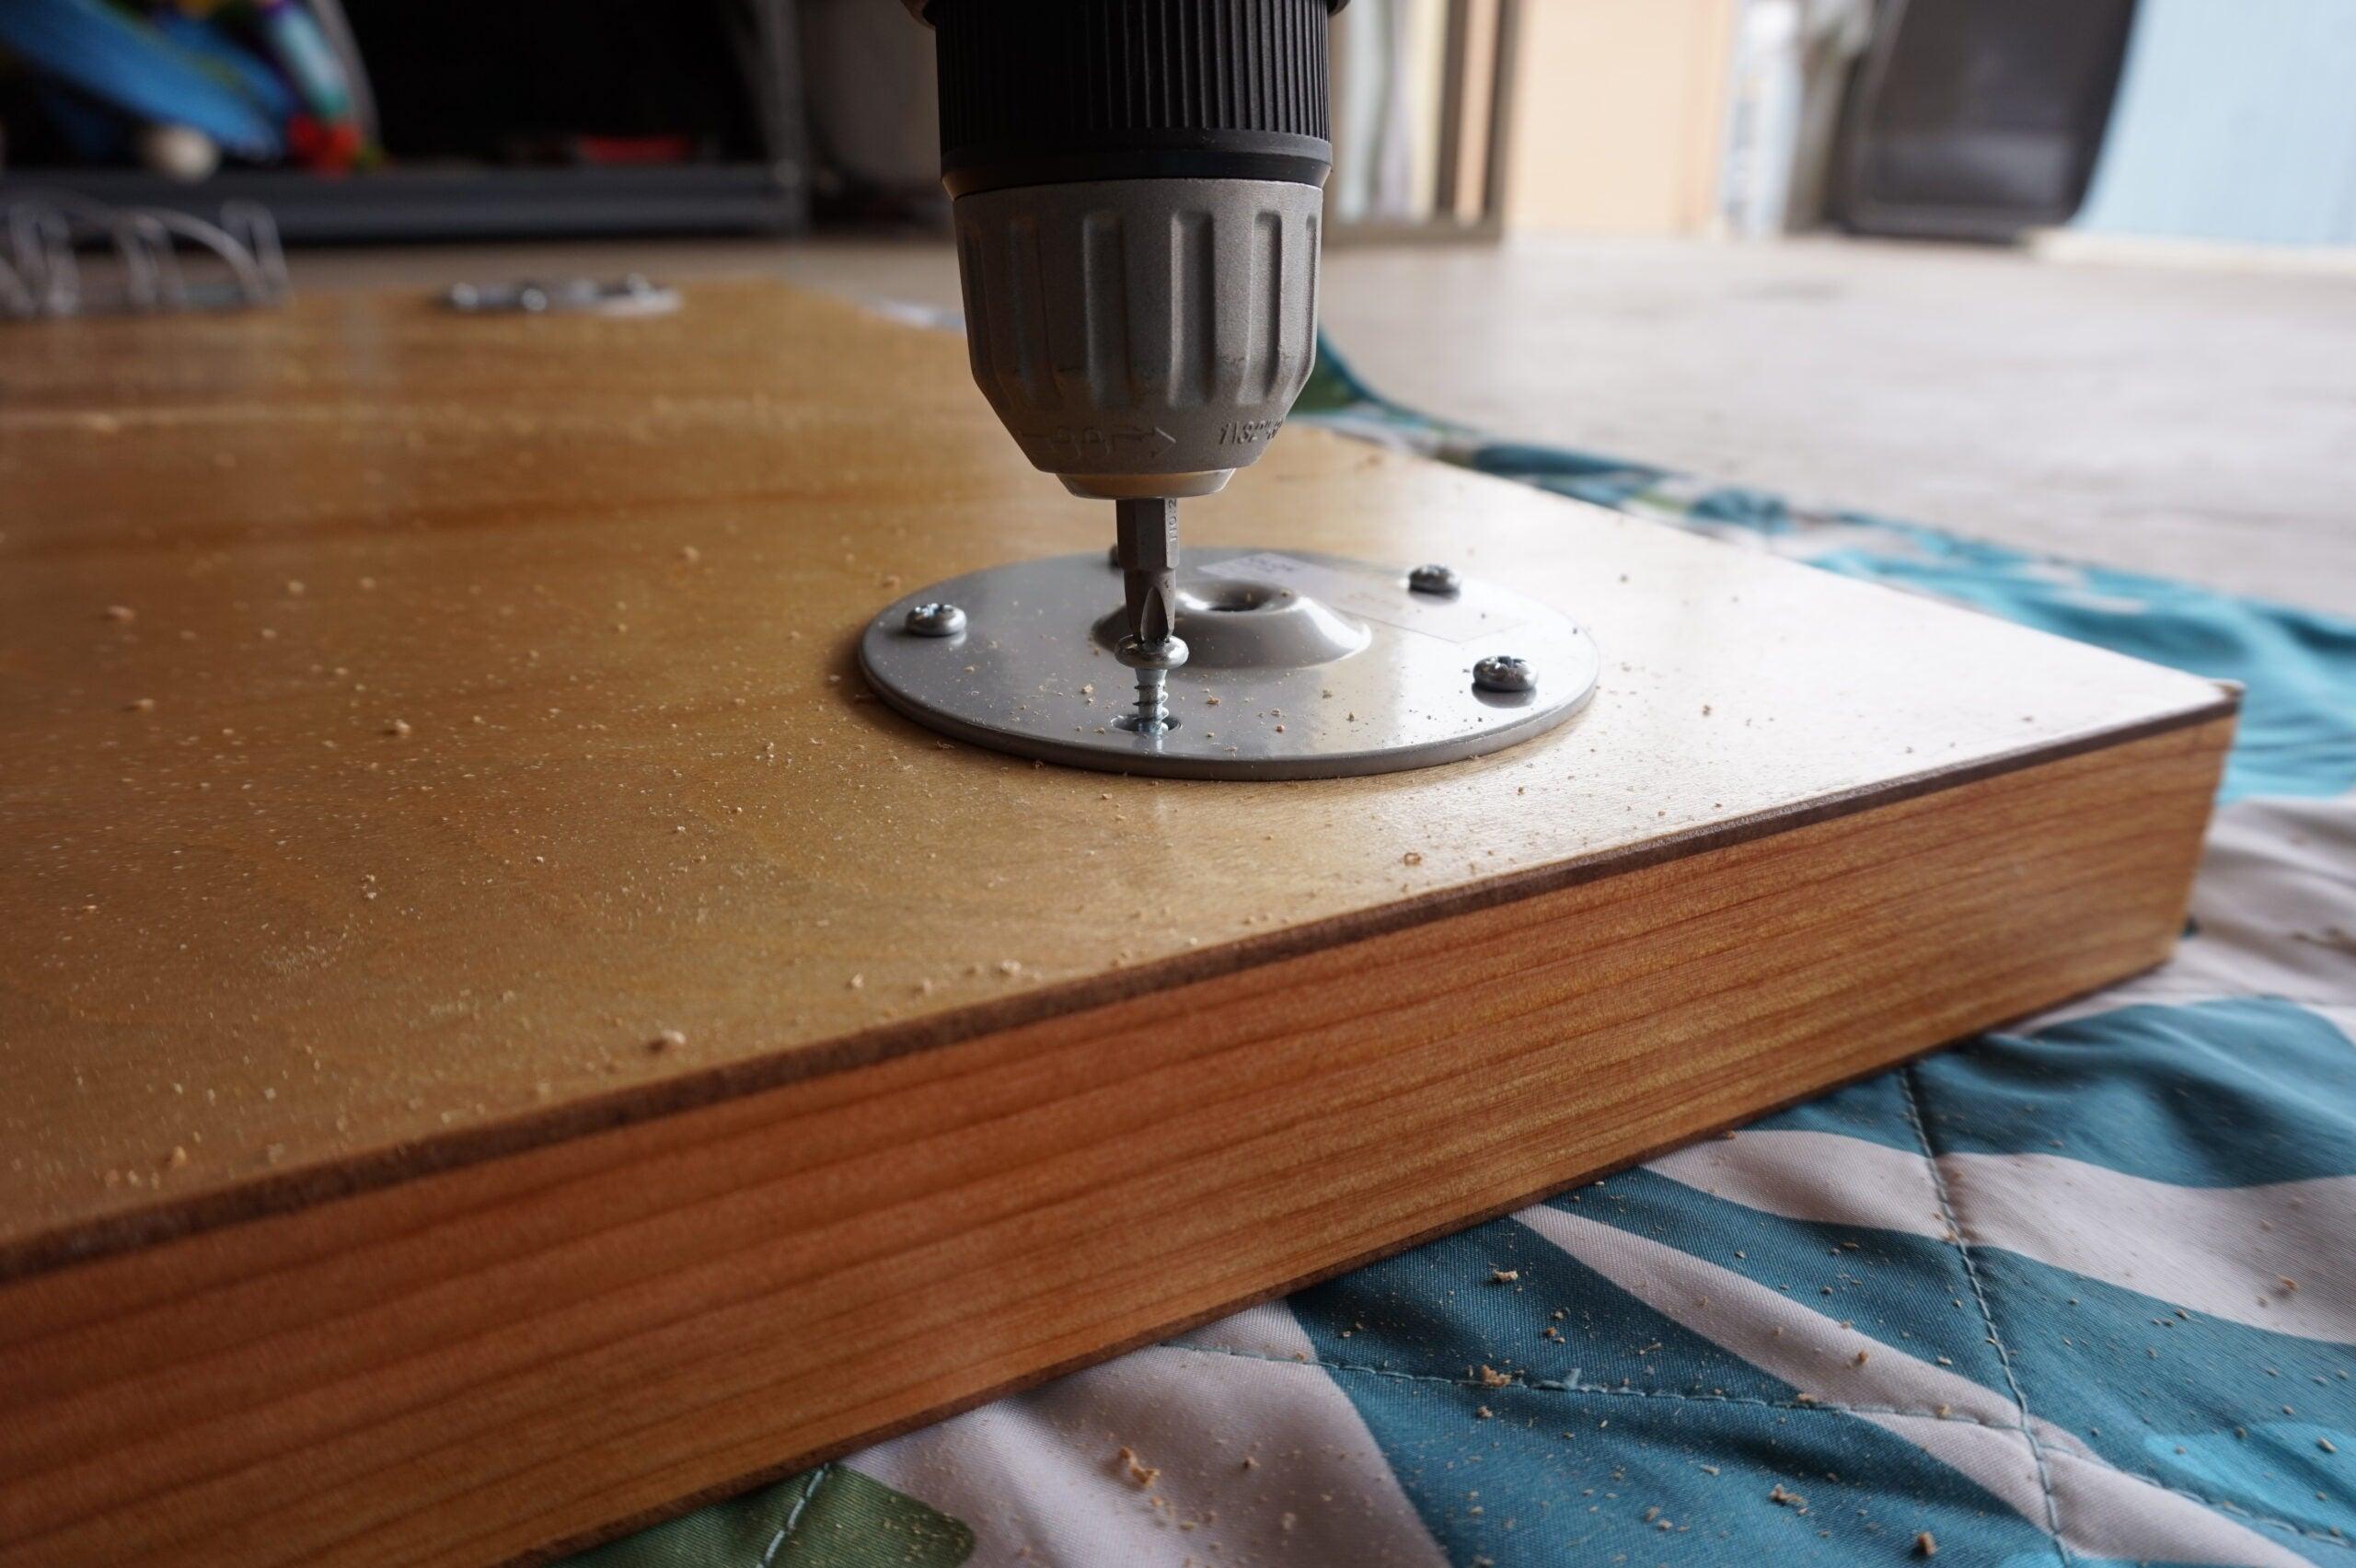 Step 4 - Start assembling